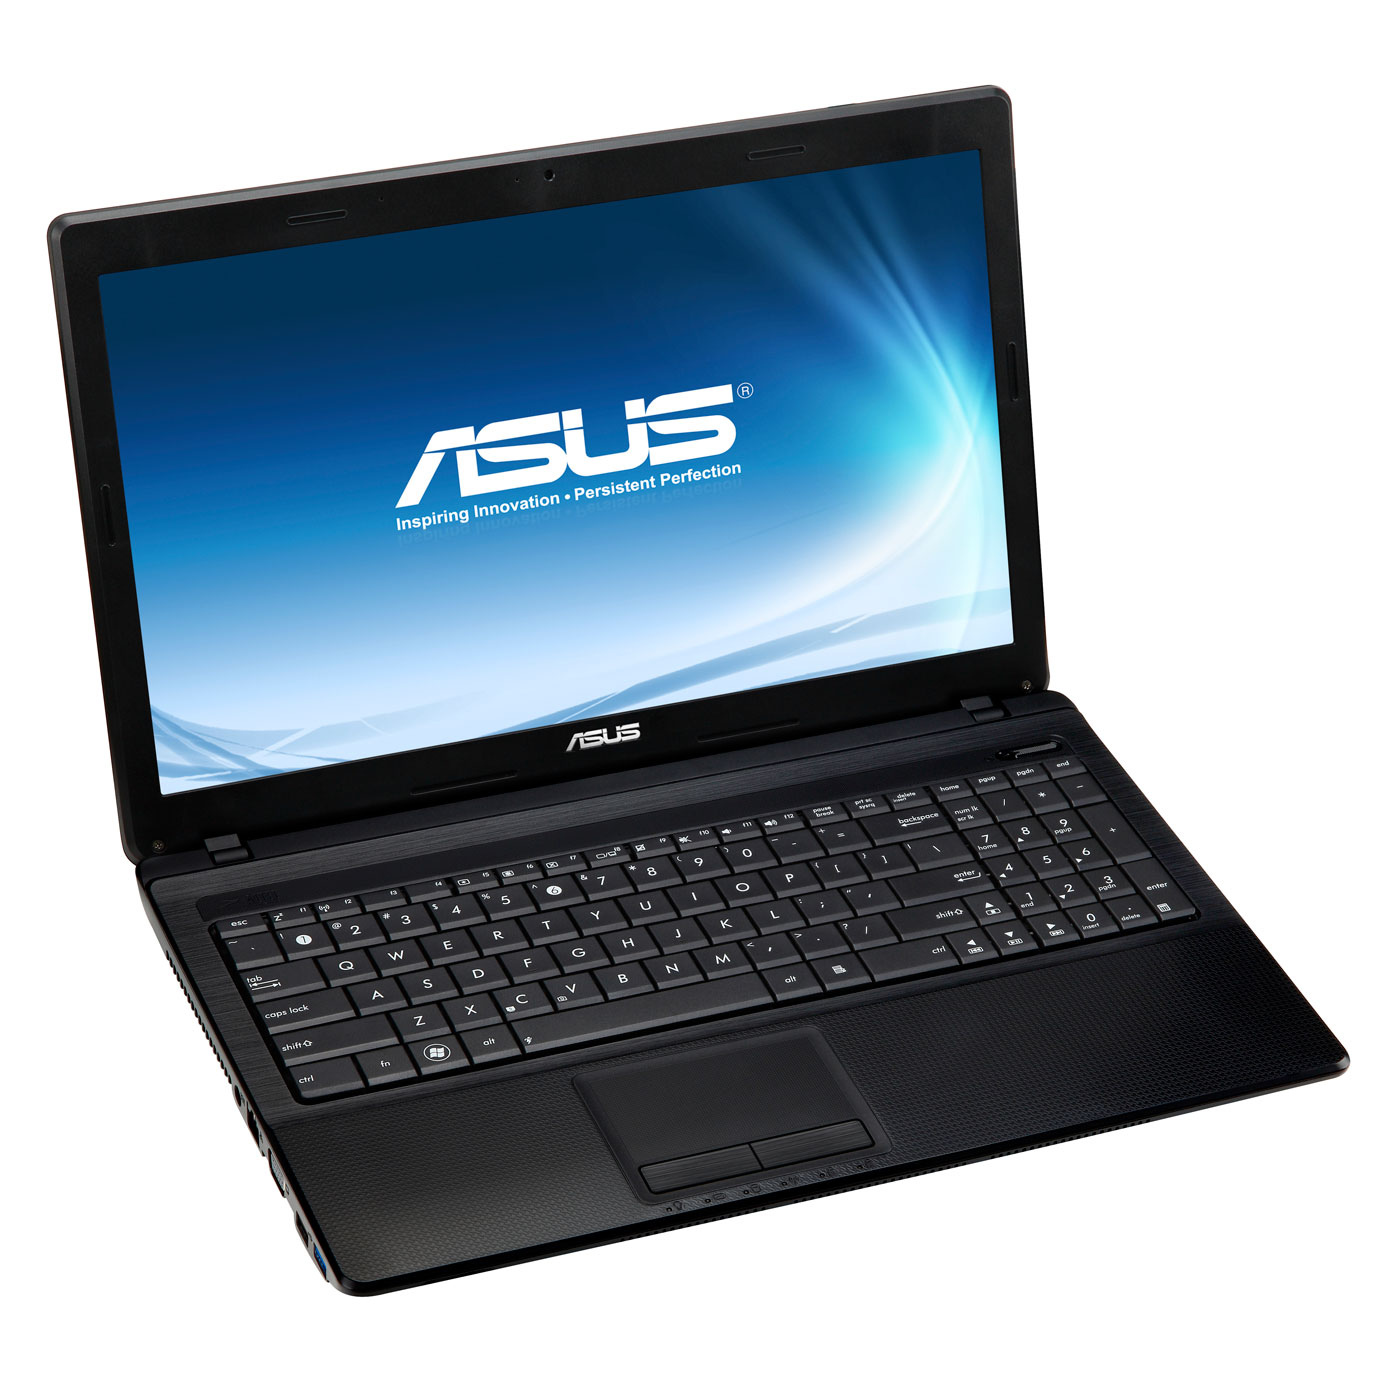 "PC portable ASUS X54C-SX292V Intel Core i3-2350M 4 Go 320 Go 15.6"" LED Graveur DVD Wi-Fi N Webcam Windows 7 Premium 64 bits (garantie constructeur 1 an)"